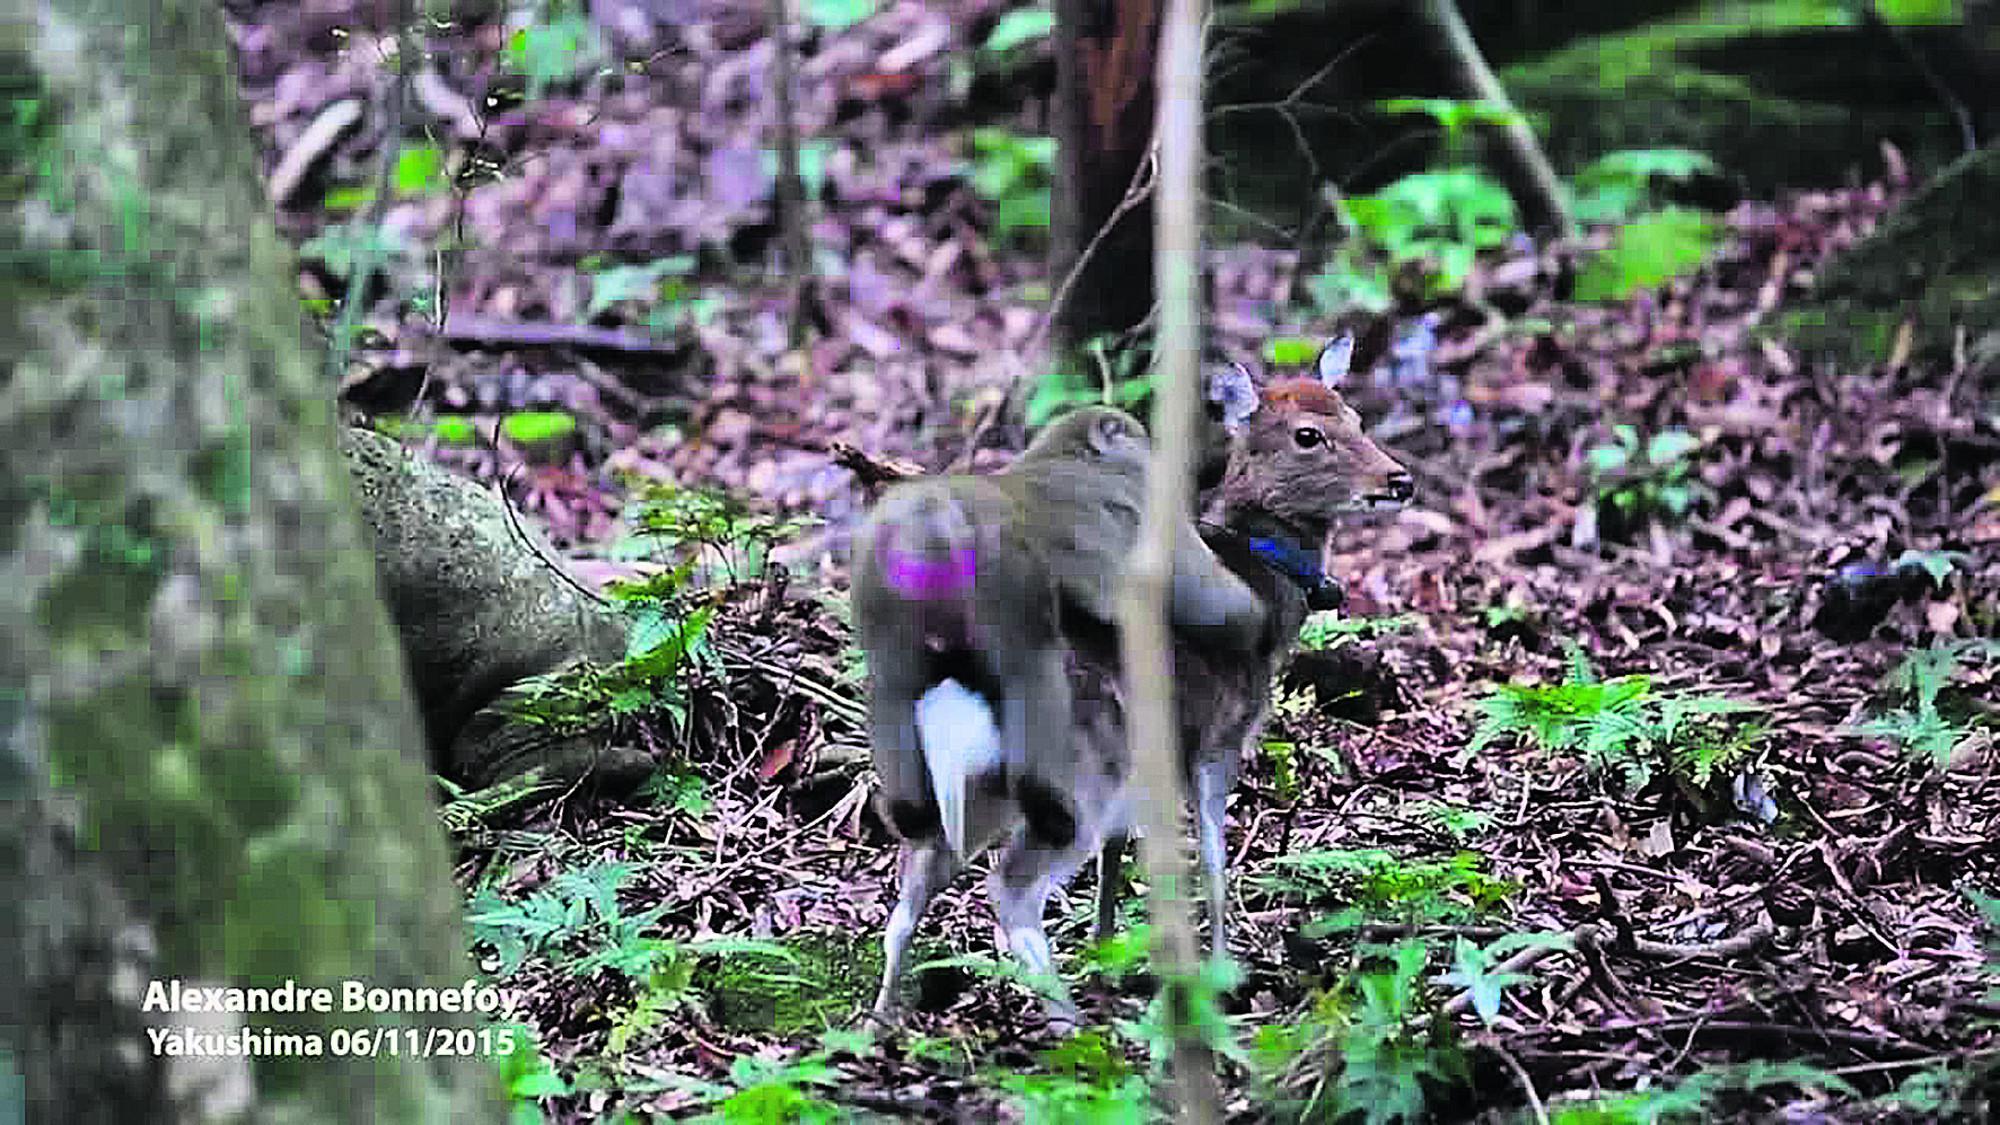 makakas-elafina-1 Ο παράφορος έρωτας του μακάκα με μια ελαφίνα [εικόνες & βίντεο]